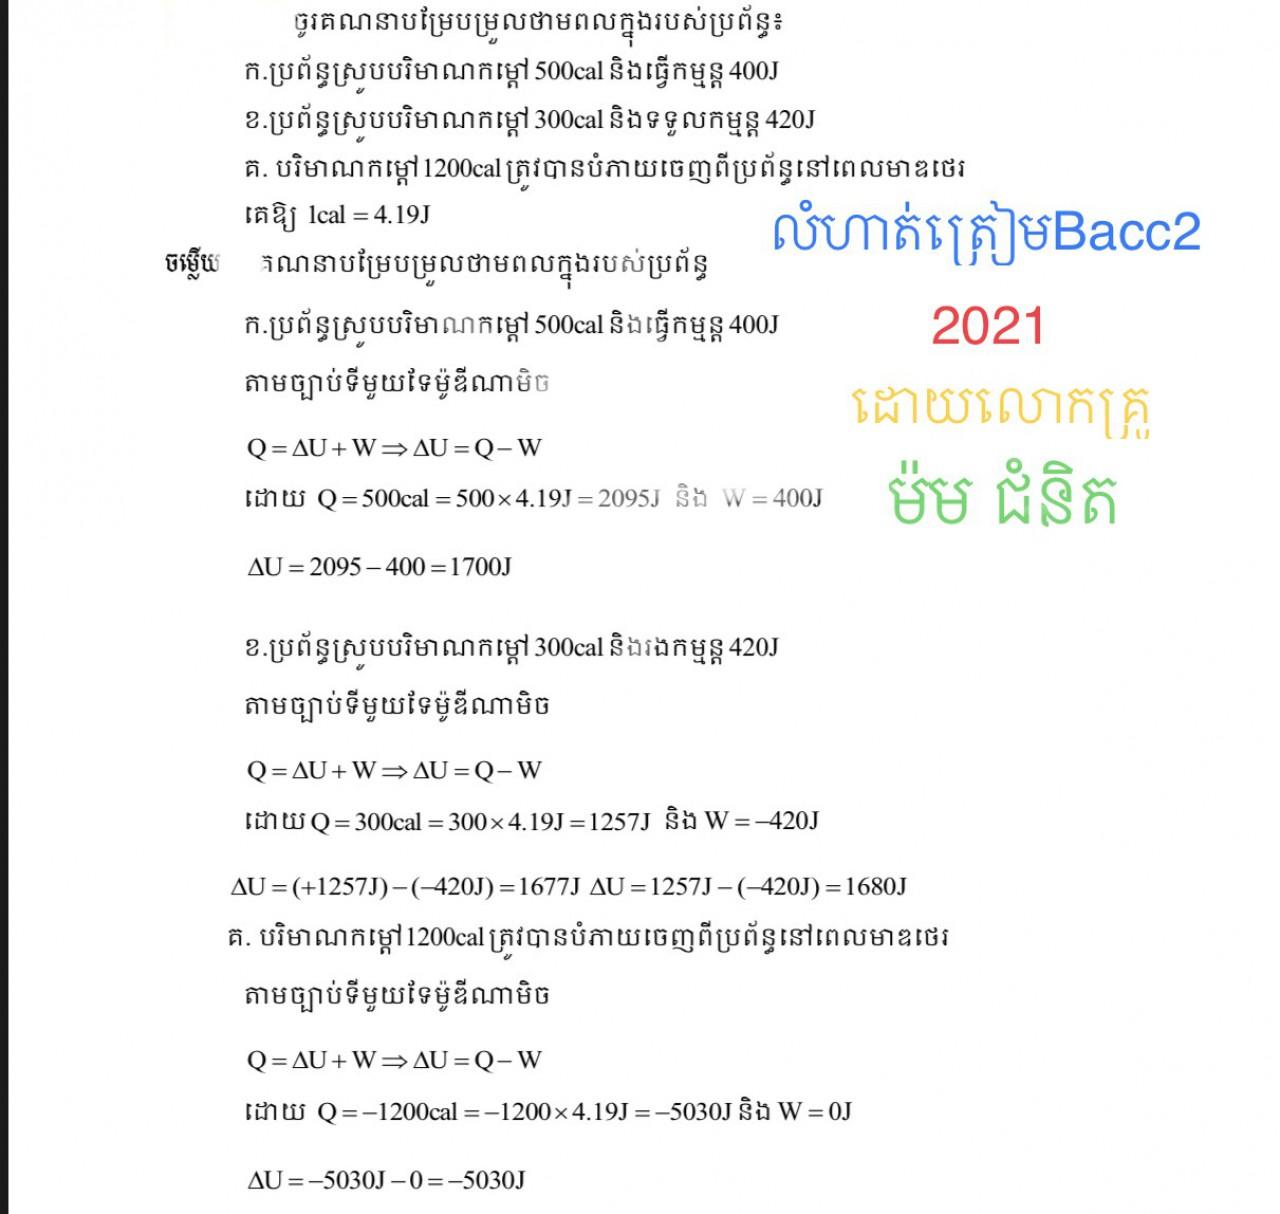 D653103F-1488-4B7A-B8D5-AD23B6CF8EAC